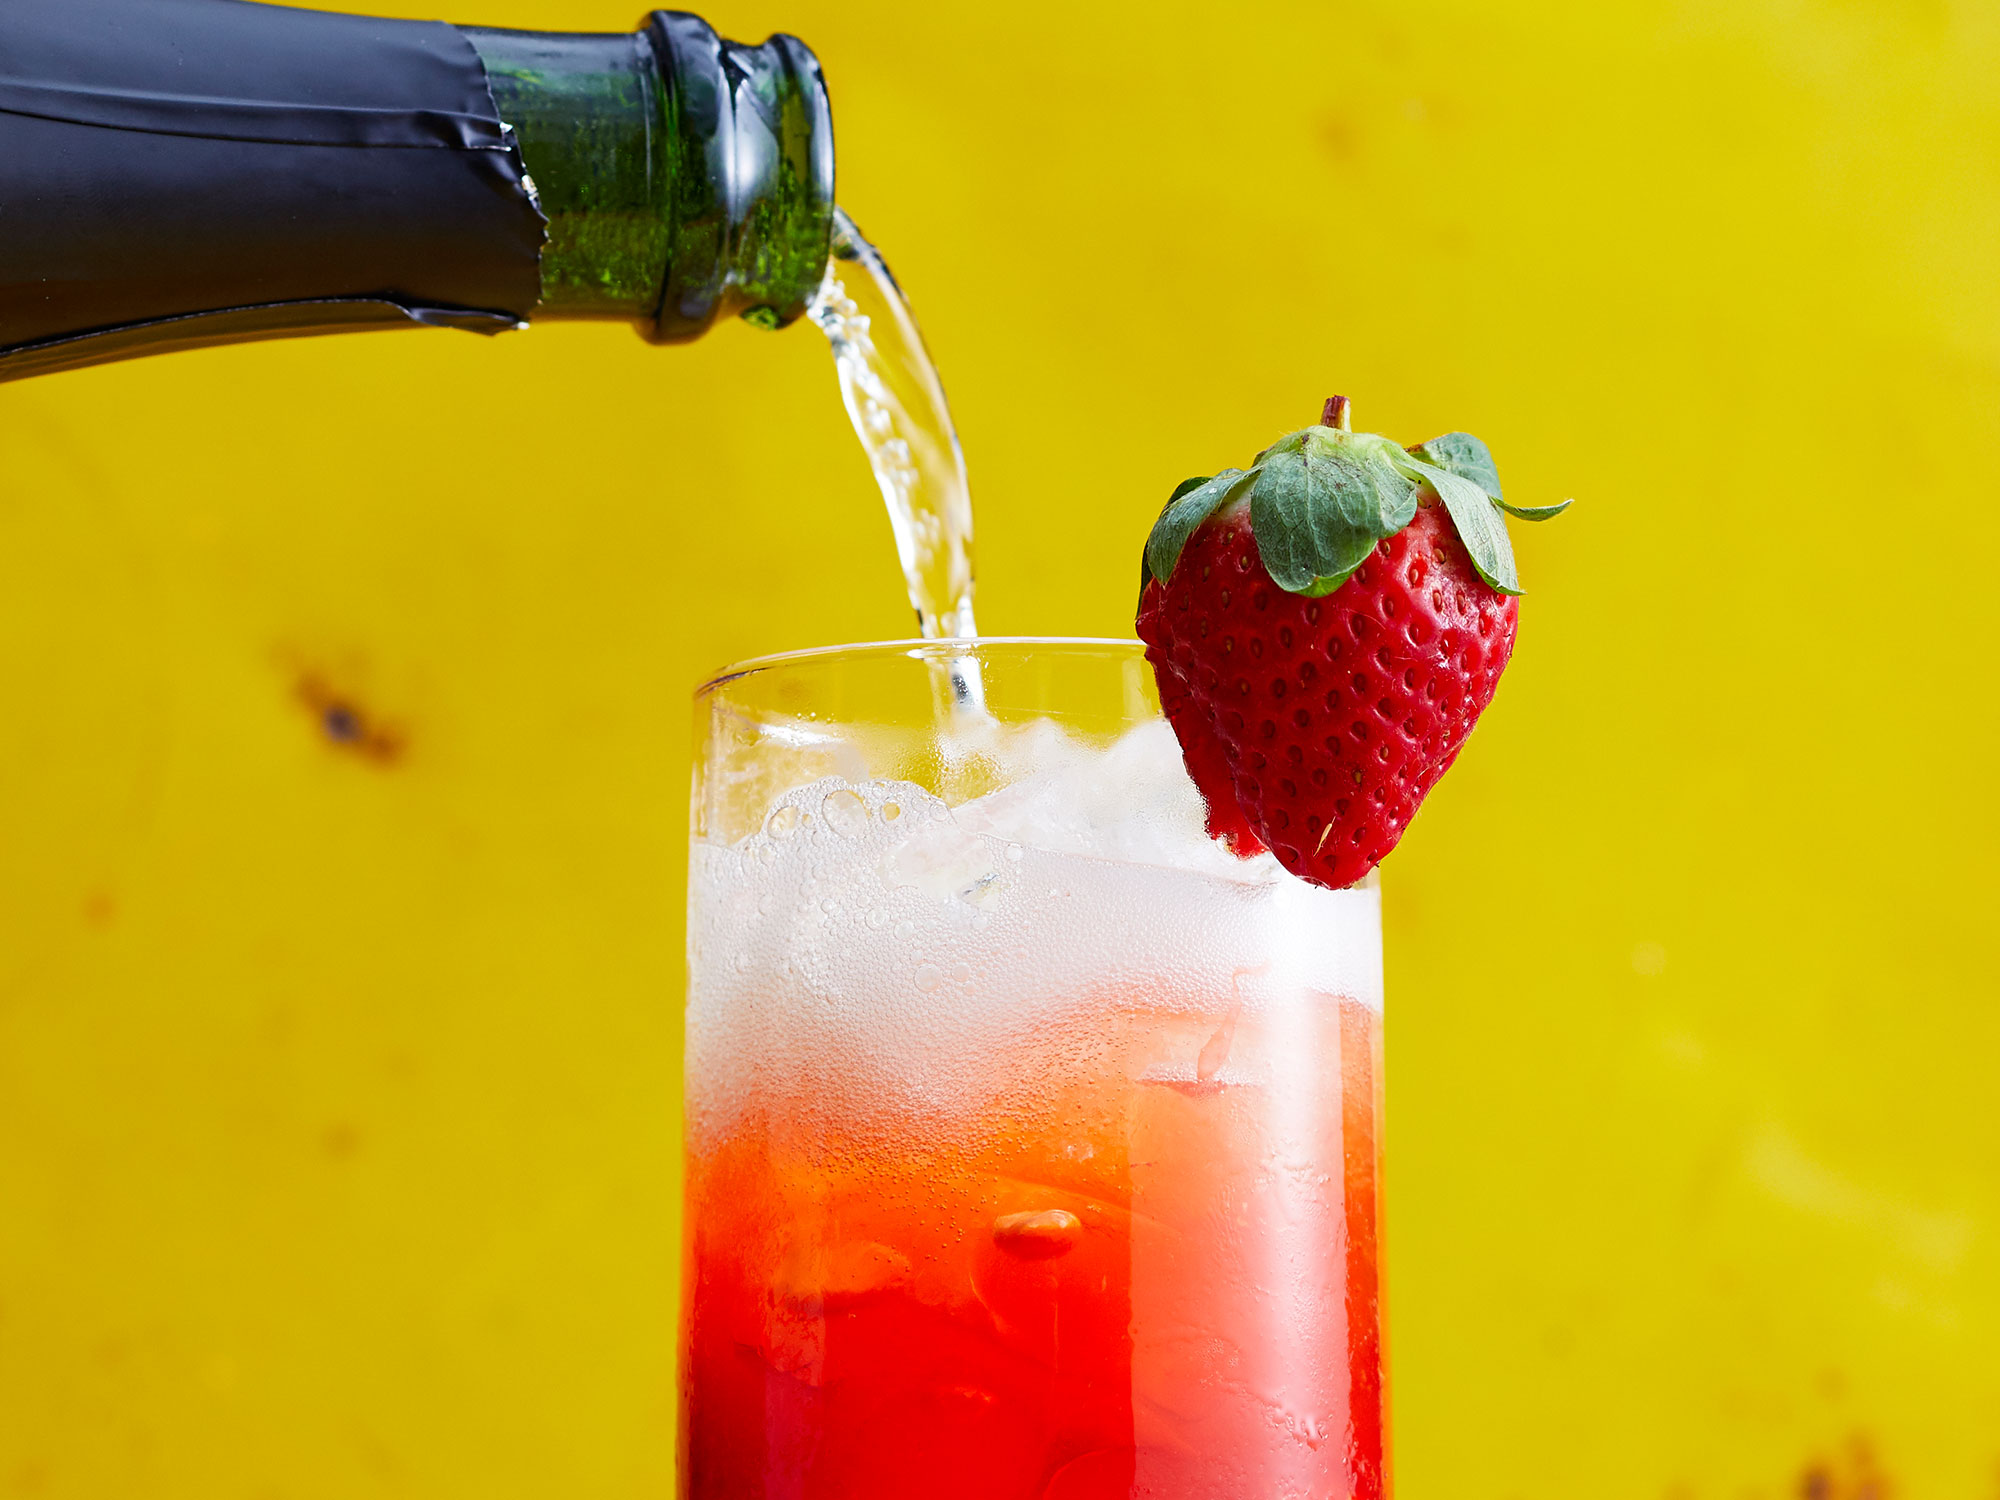 jungle-juice-mimosa-video-inline.jpg